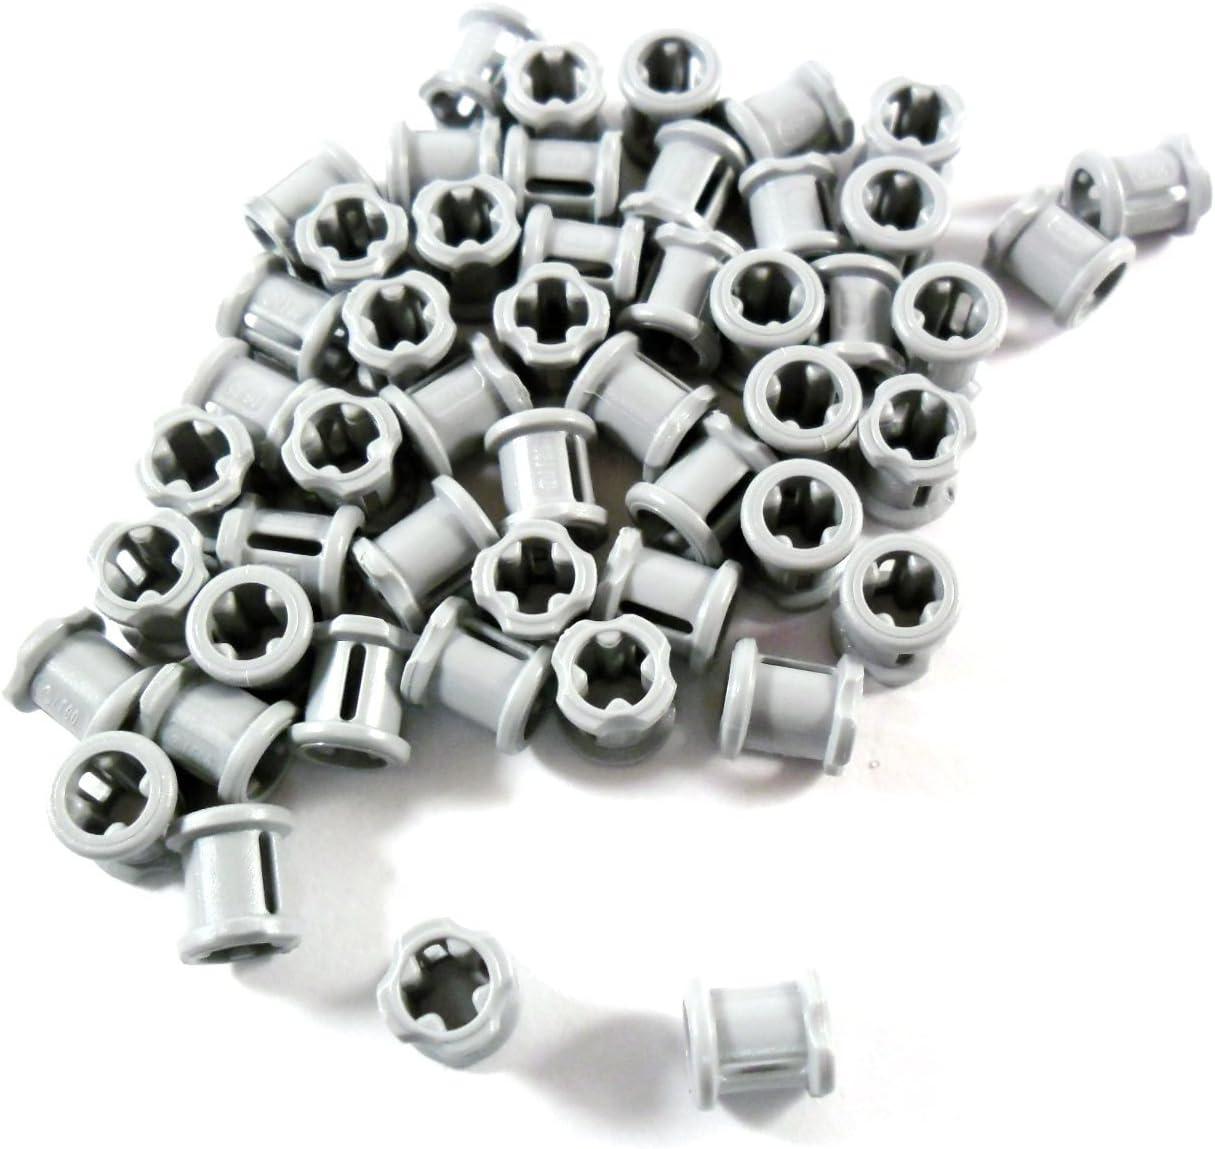 20 Studs ~ Technic ~ New Lego Black Connector Bushing Pins